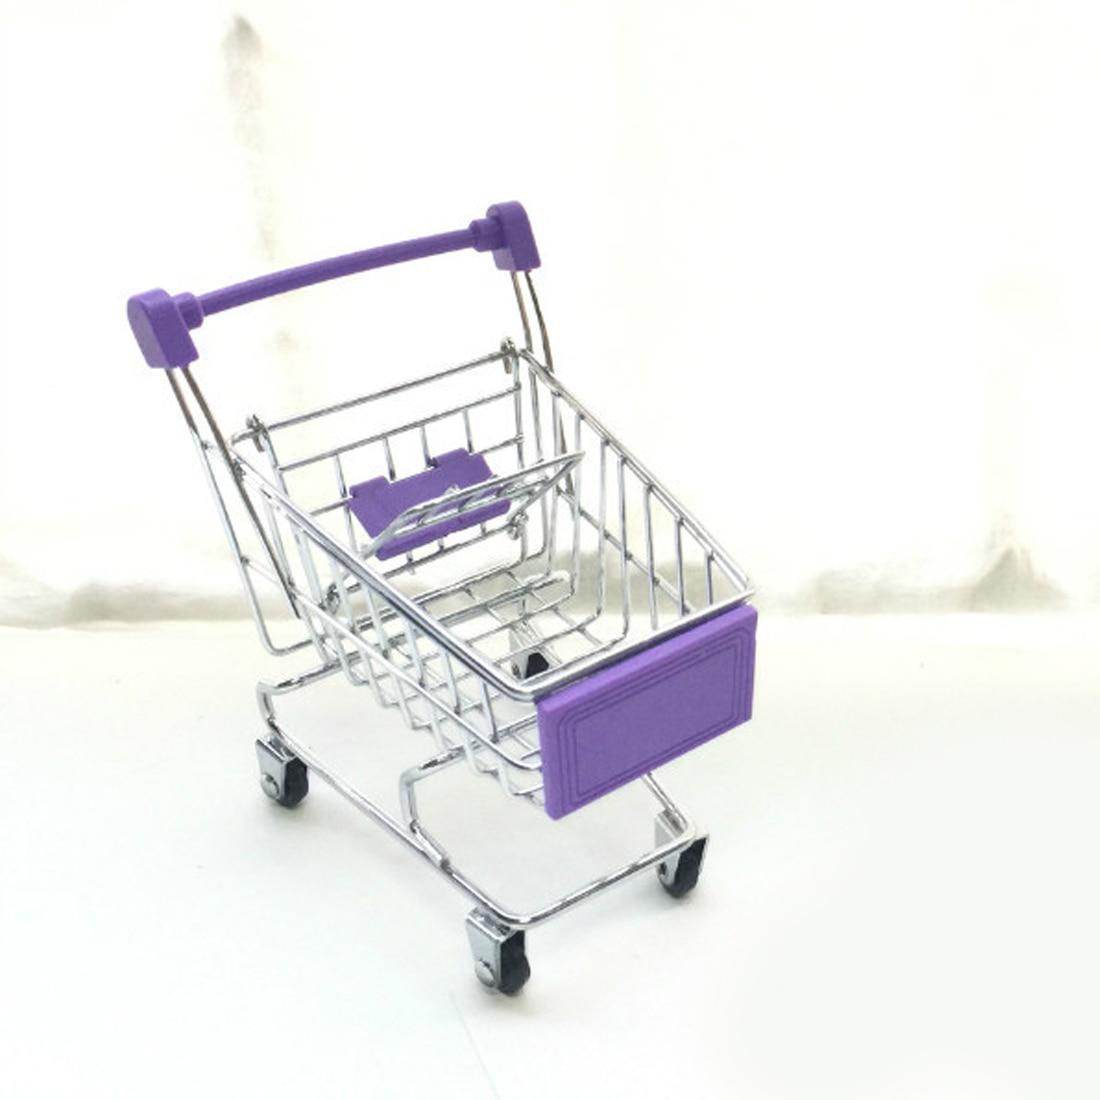 Yaochen Mini Supermarket Handcart Trolley Shopping Utility Cart Phone Holder Office Desk Storage Toy Cart Baby Toy